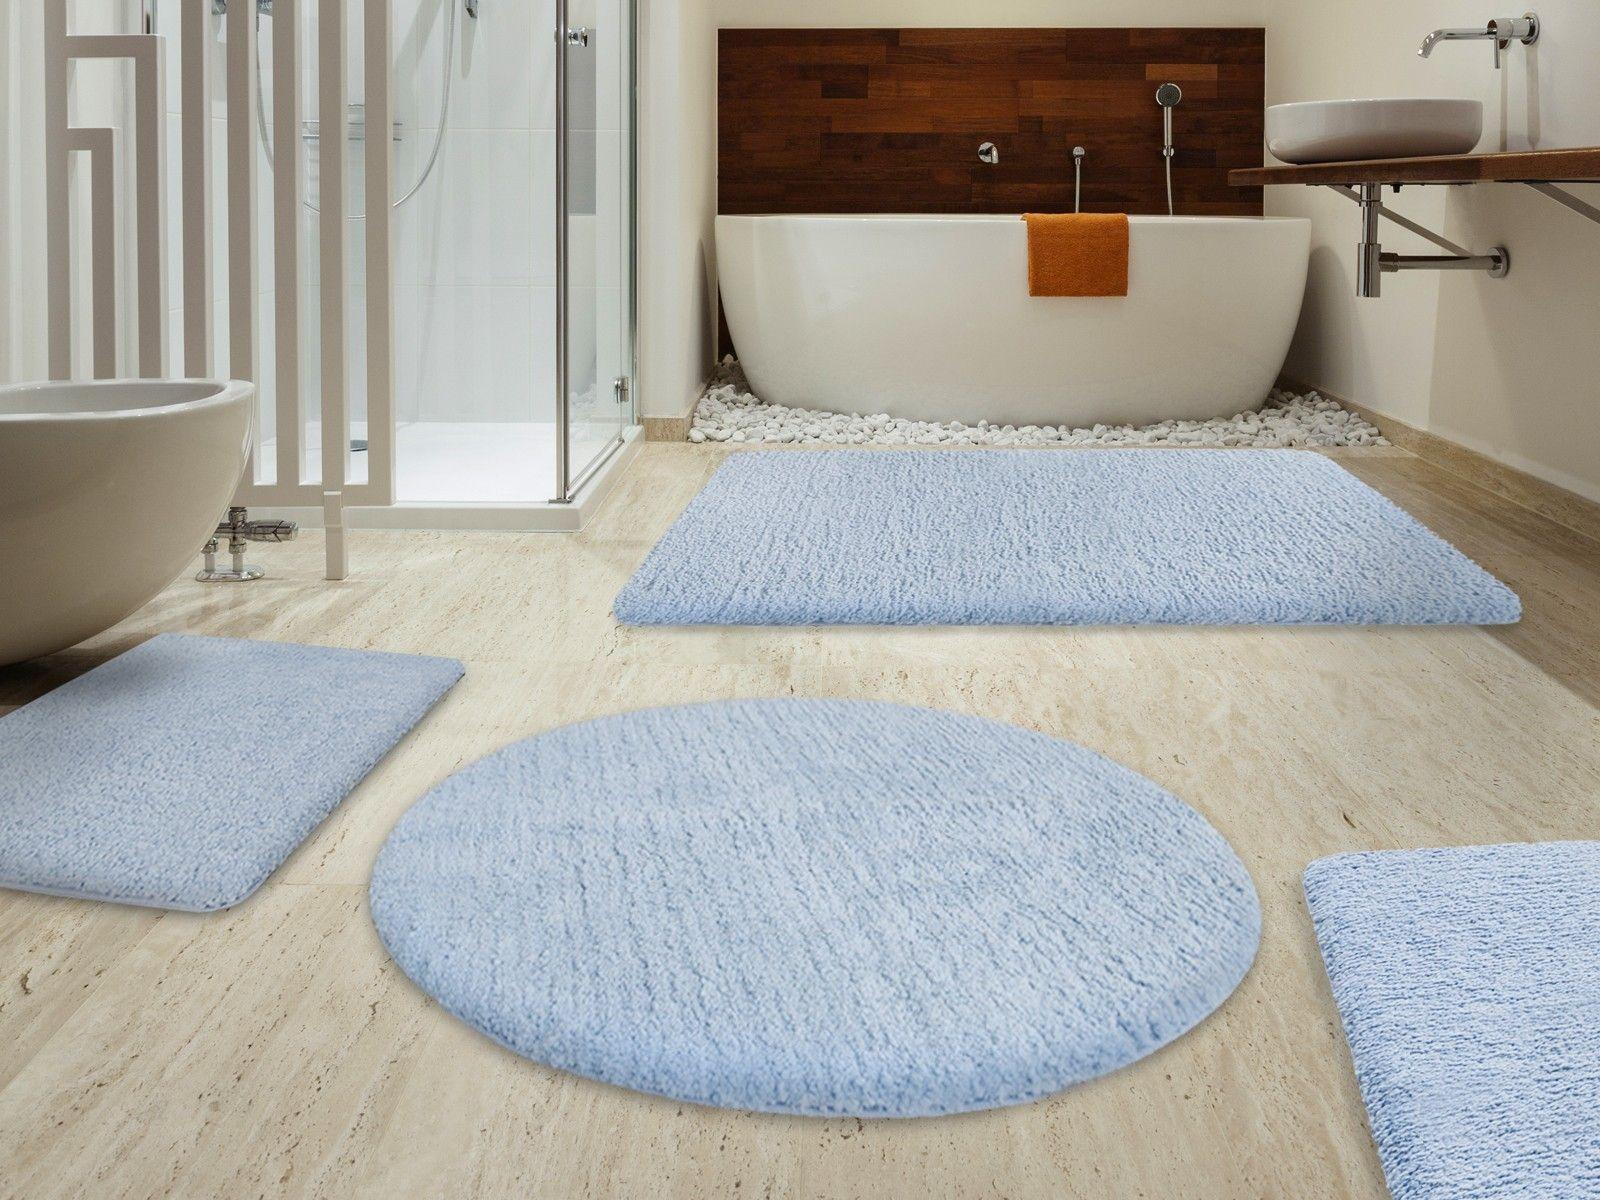 Bathroom Mats Sets 3 Pieces  Bathroom Design 20172018 Amusing 3 Piece Bathroom Rug Sets Inspiration Design